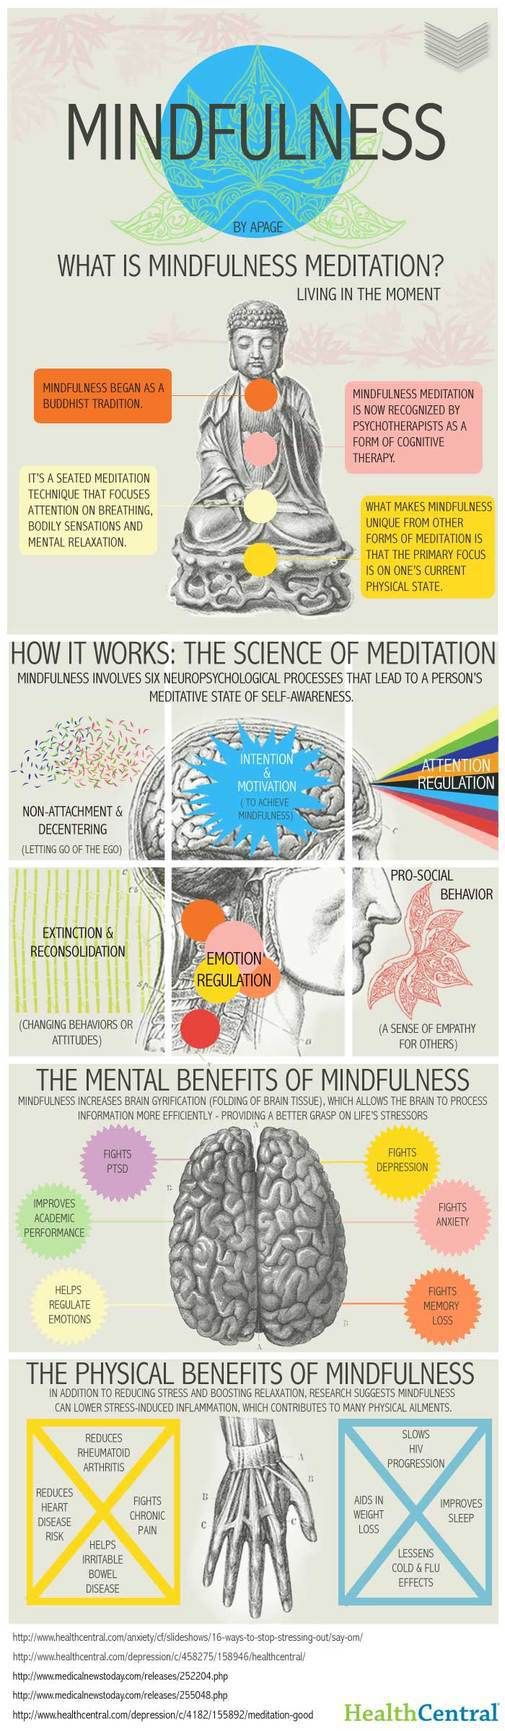 Mindfulness infographic.